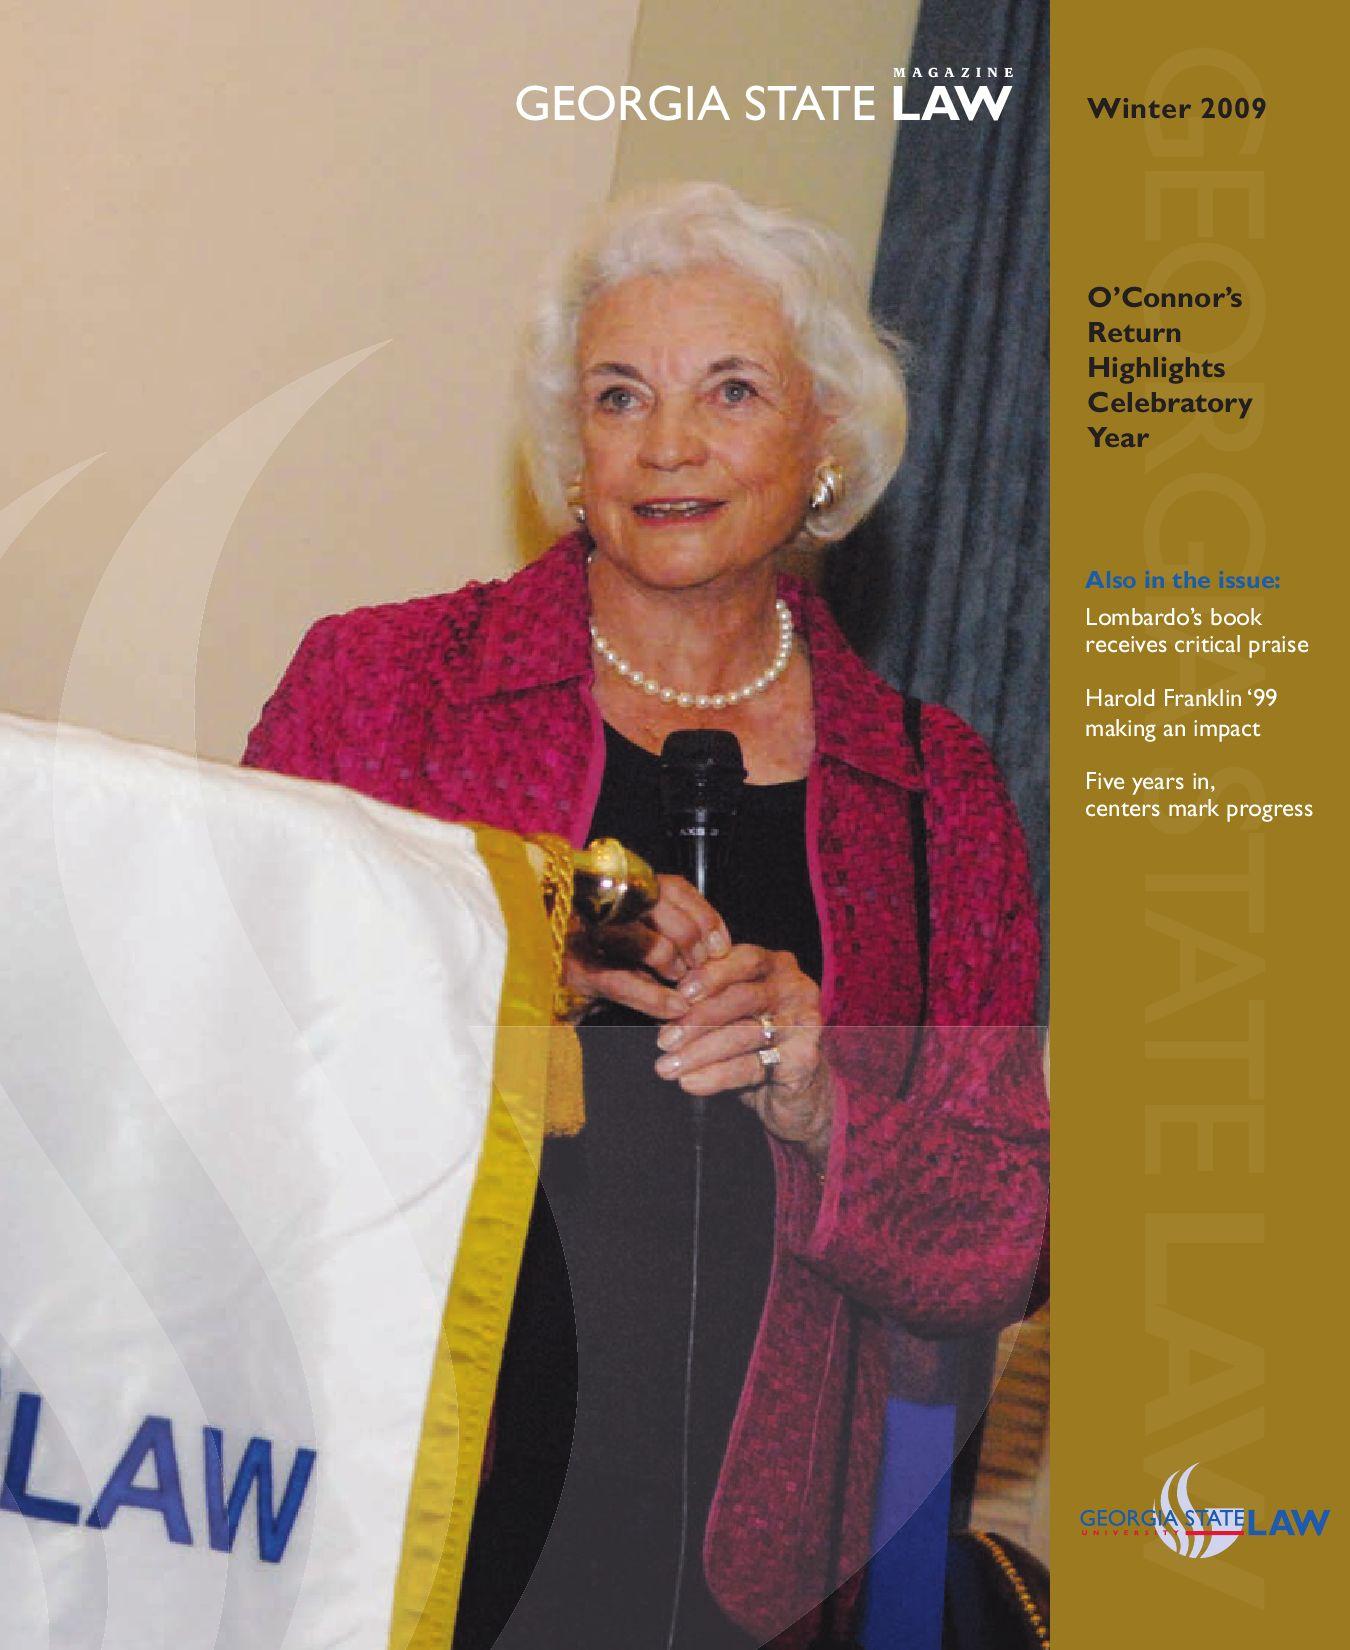 Law school admission essay service max